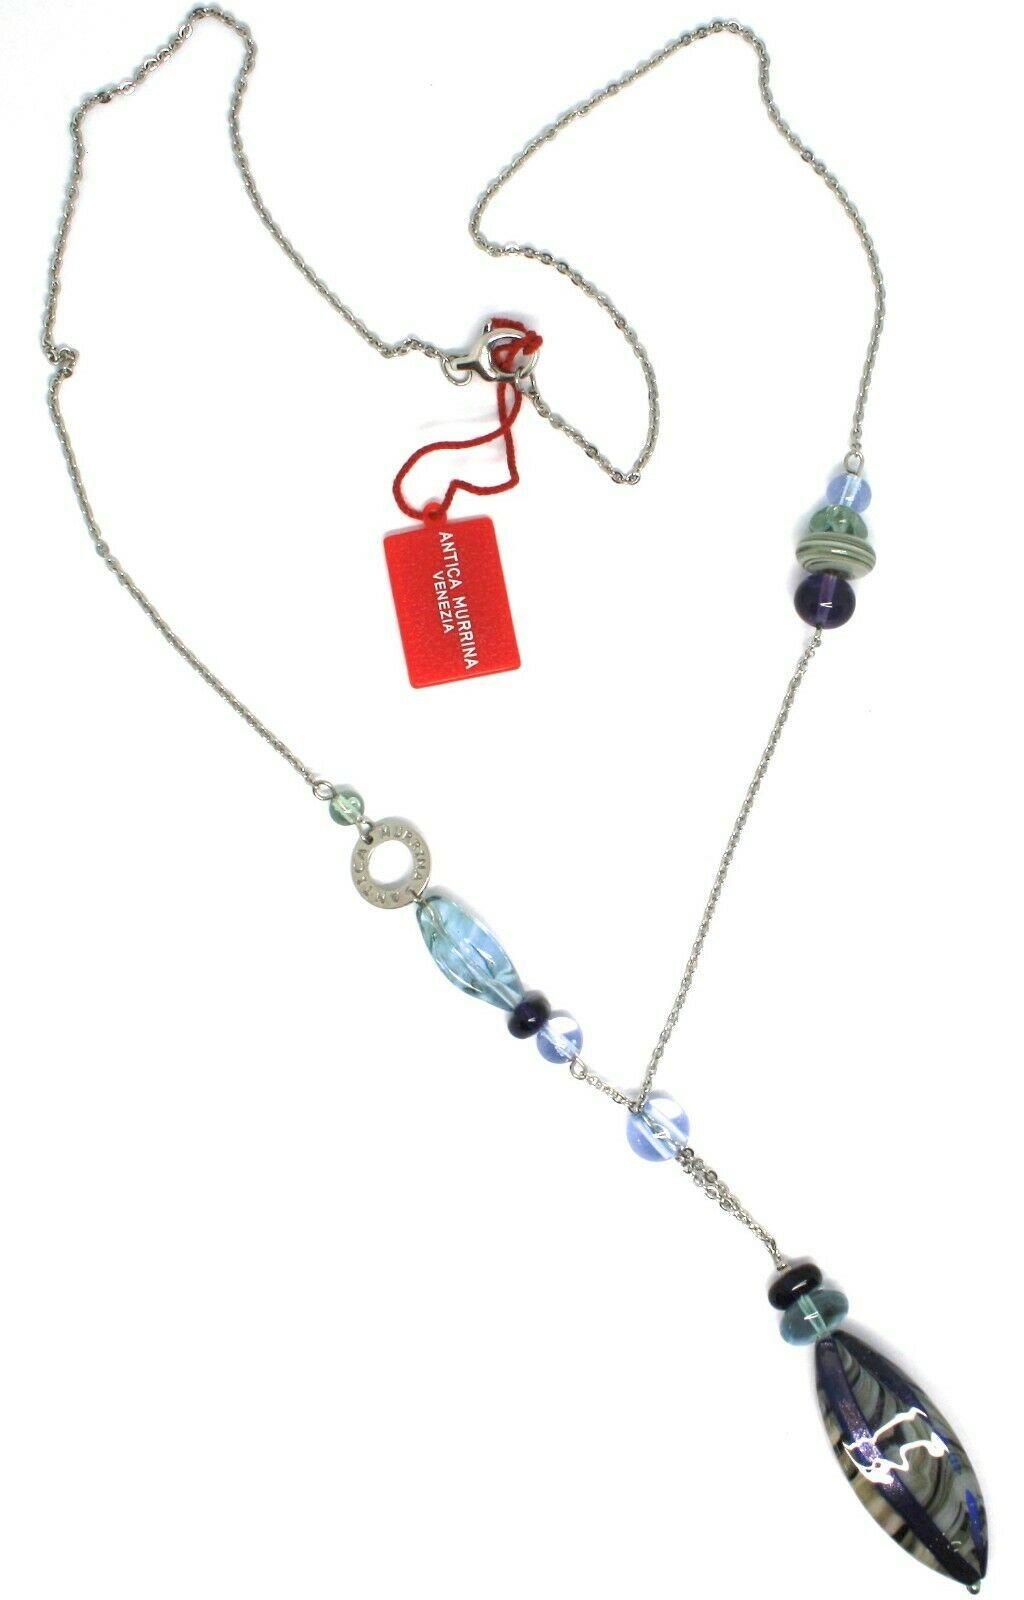 Necklace Antica Murrina Venezia, 80 cm, CO697A27, Oval Brindle Purple Pendant